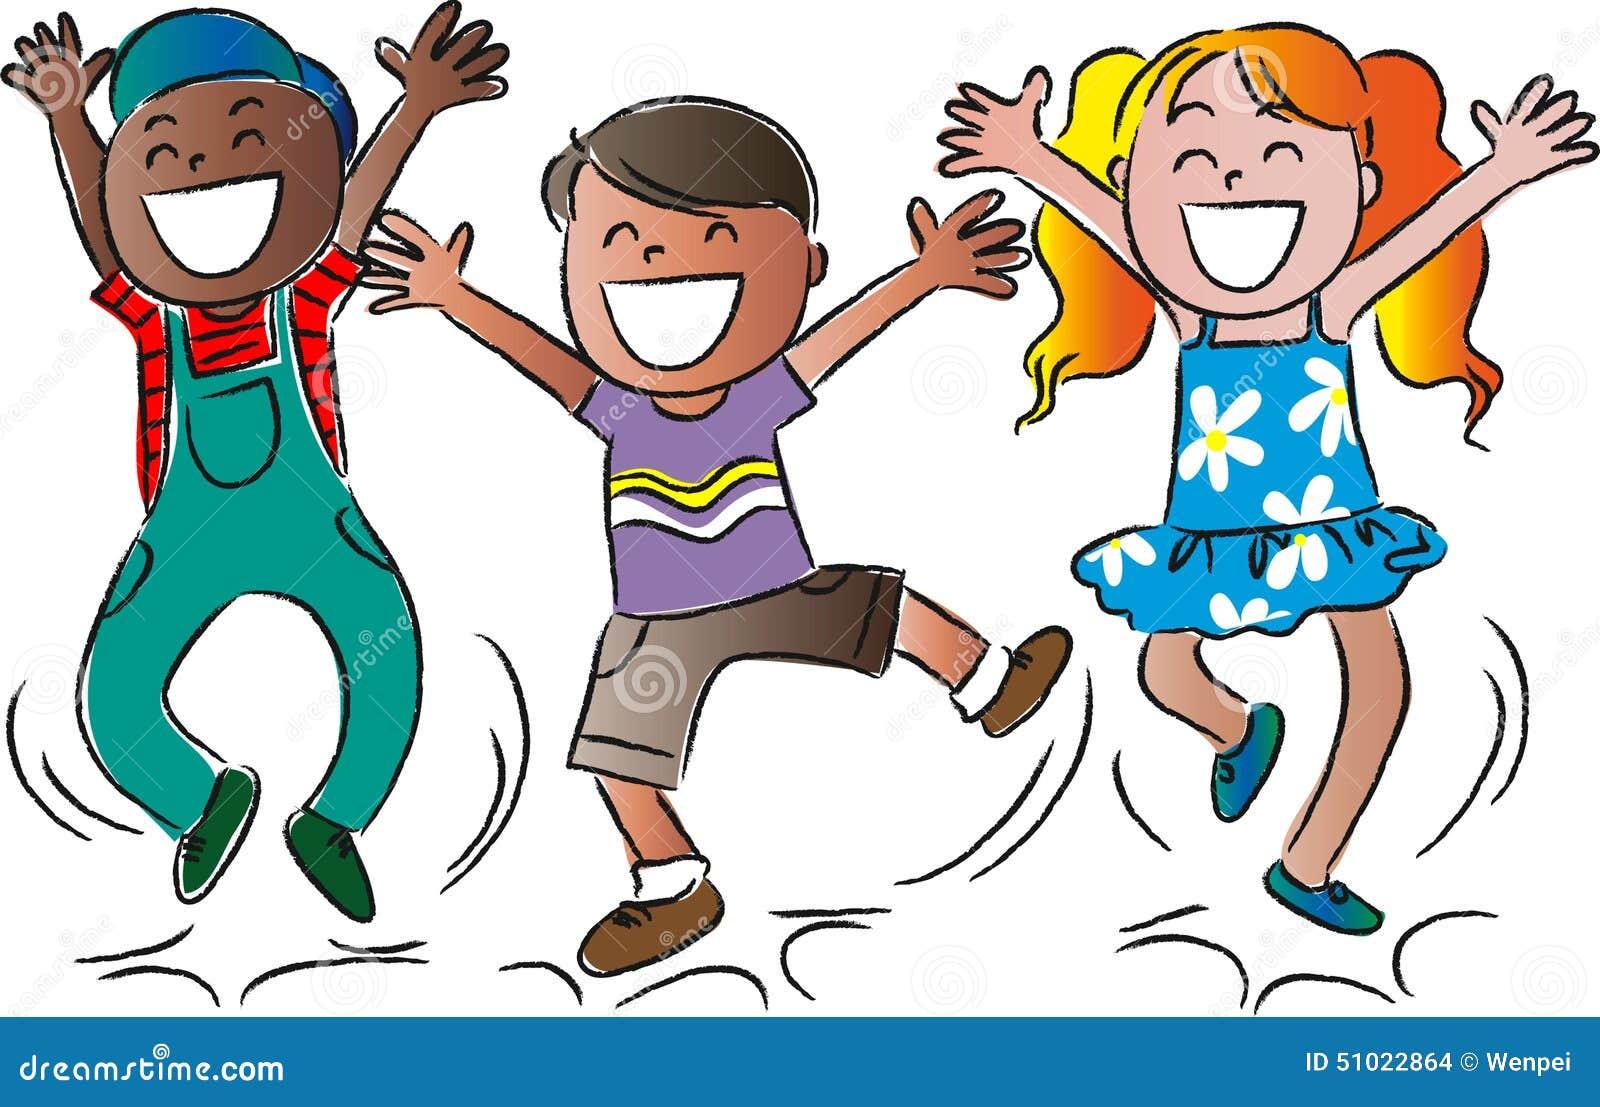 Cartoon happy jumping kids stock illustration. Image of ...  Jumping